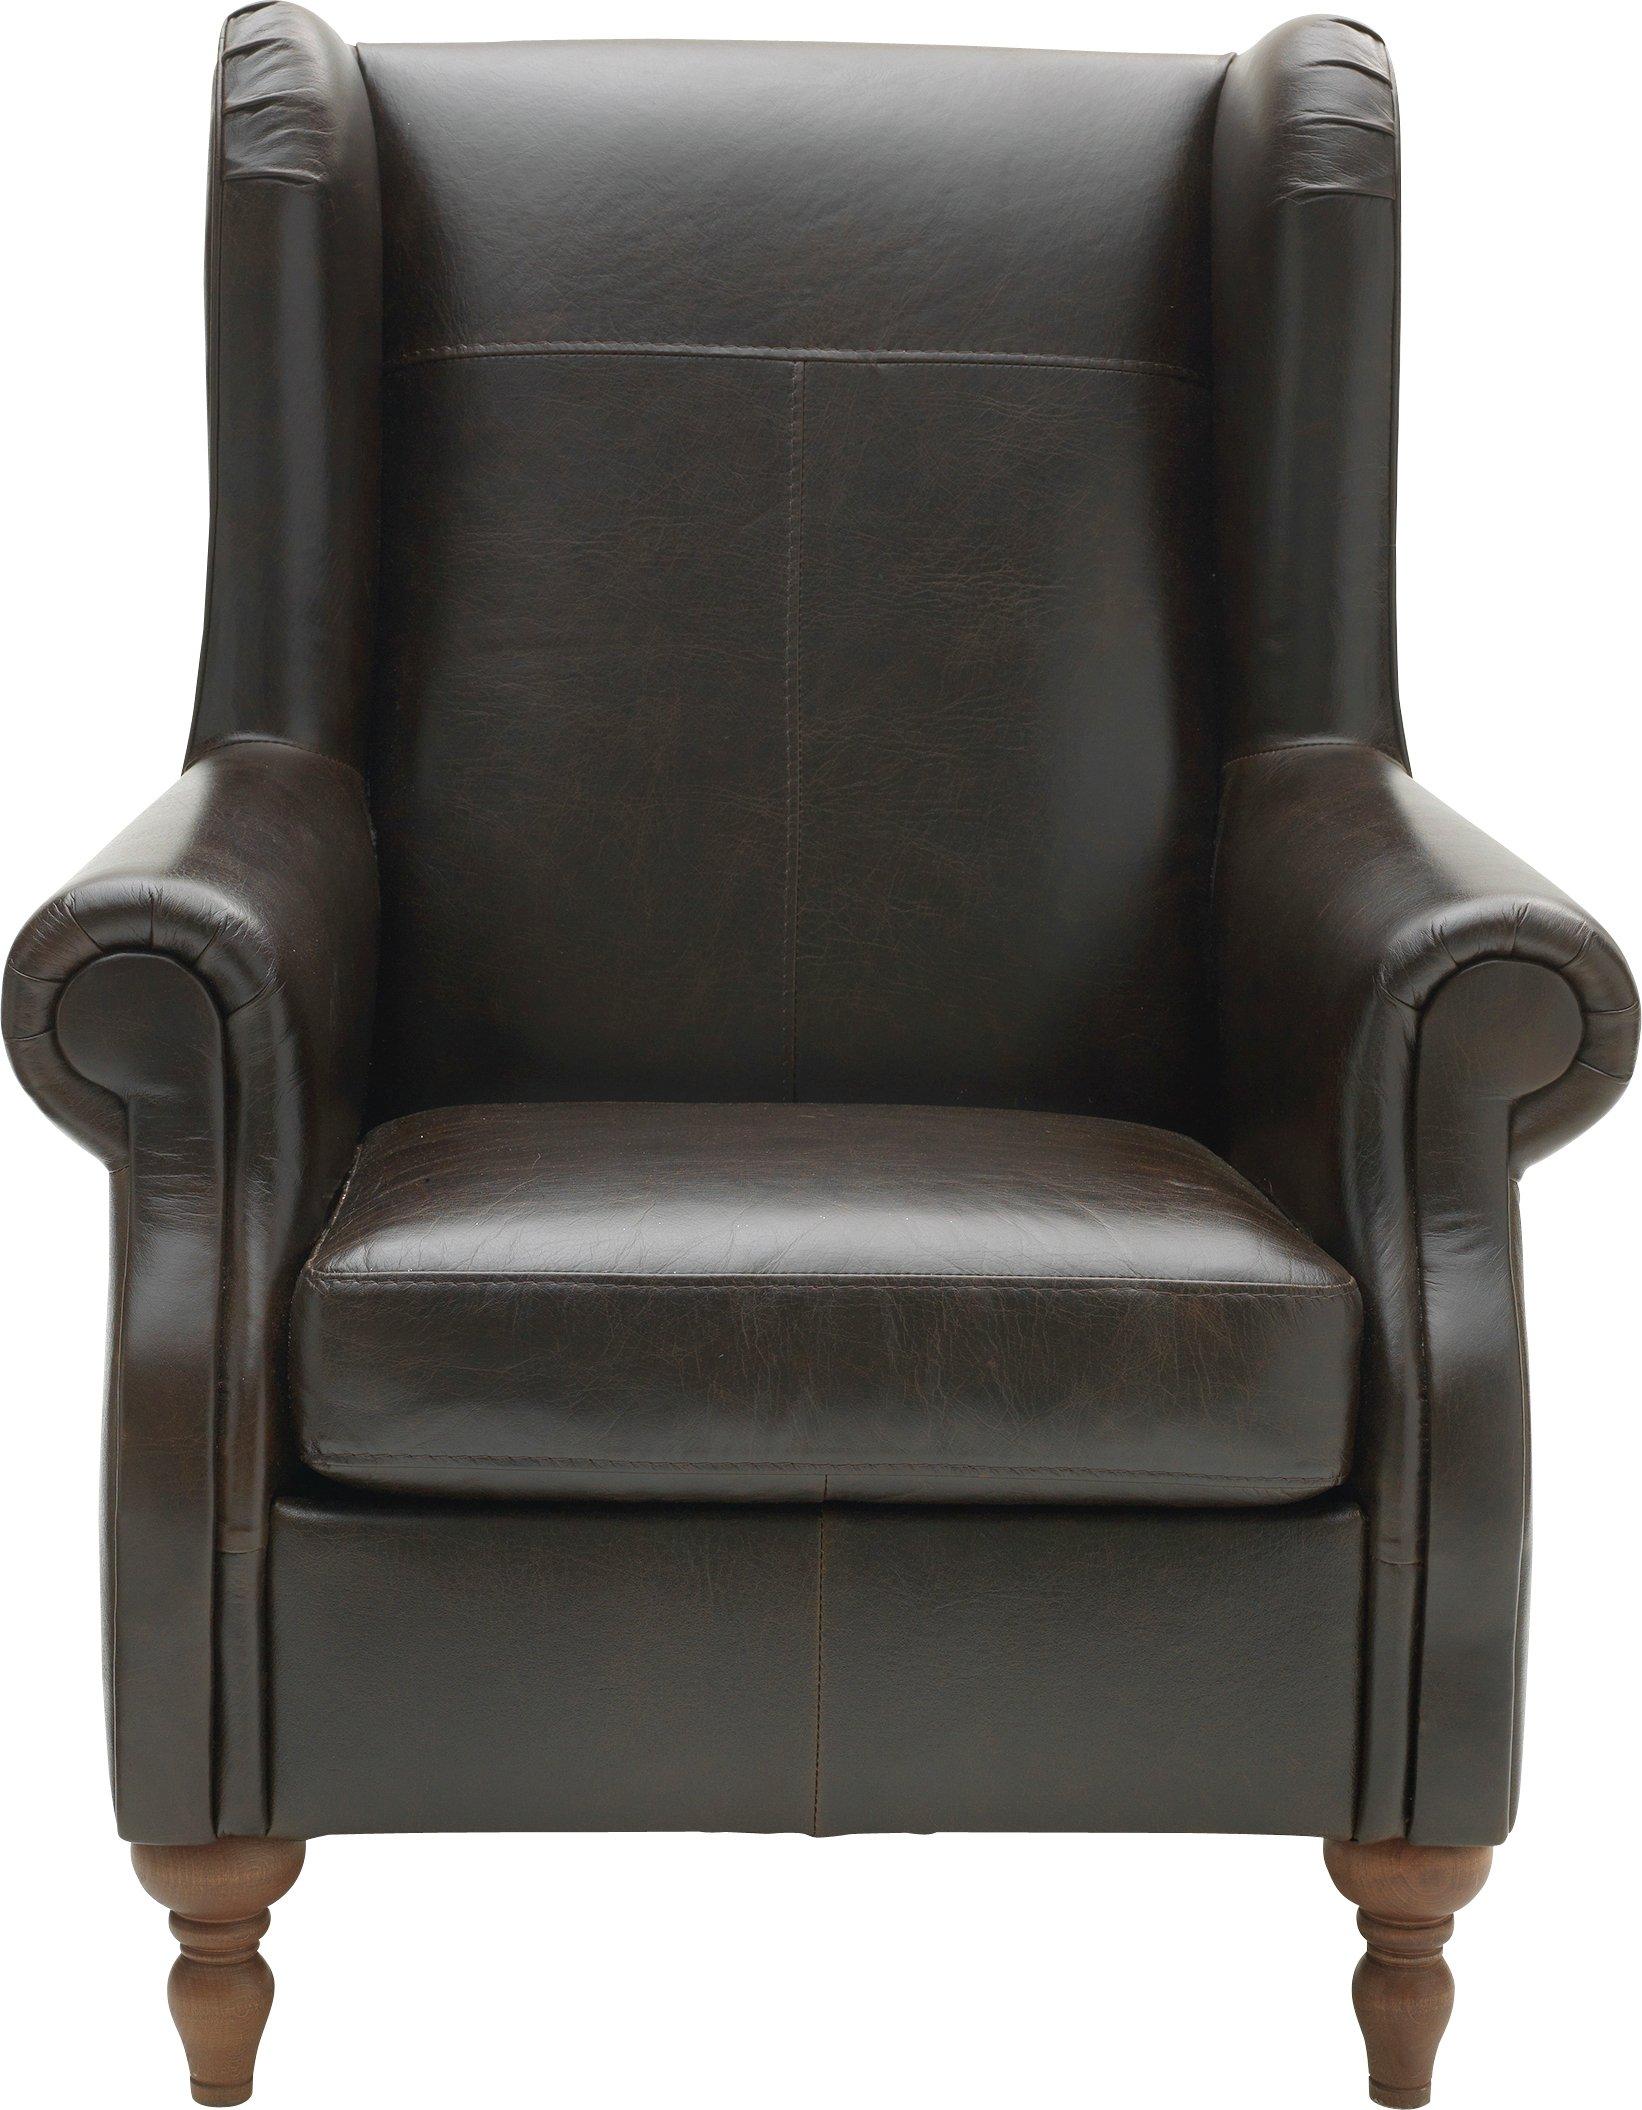 Argos Home Argyll Leather High Back Chair - Dark Brown